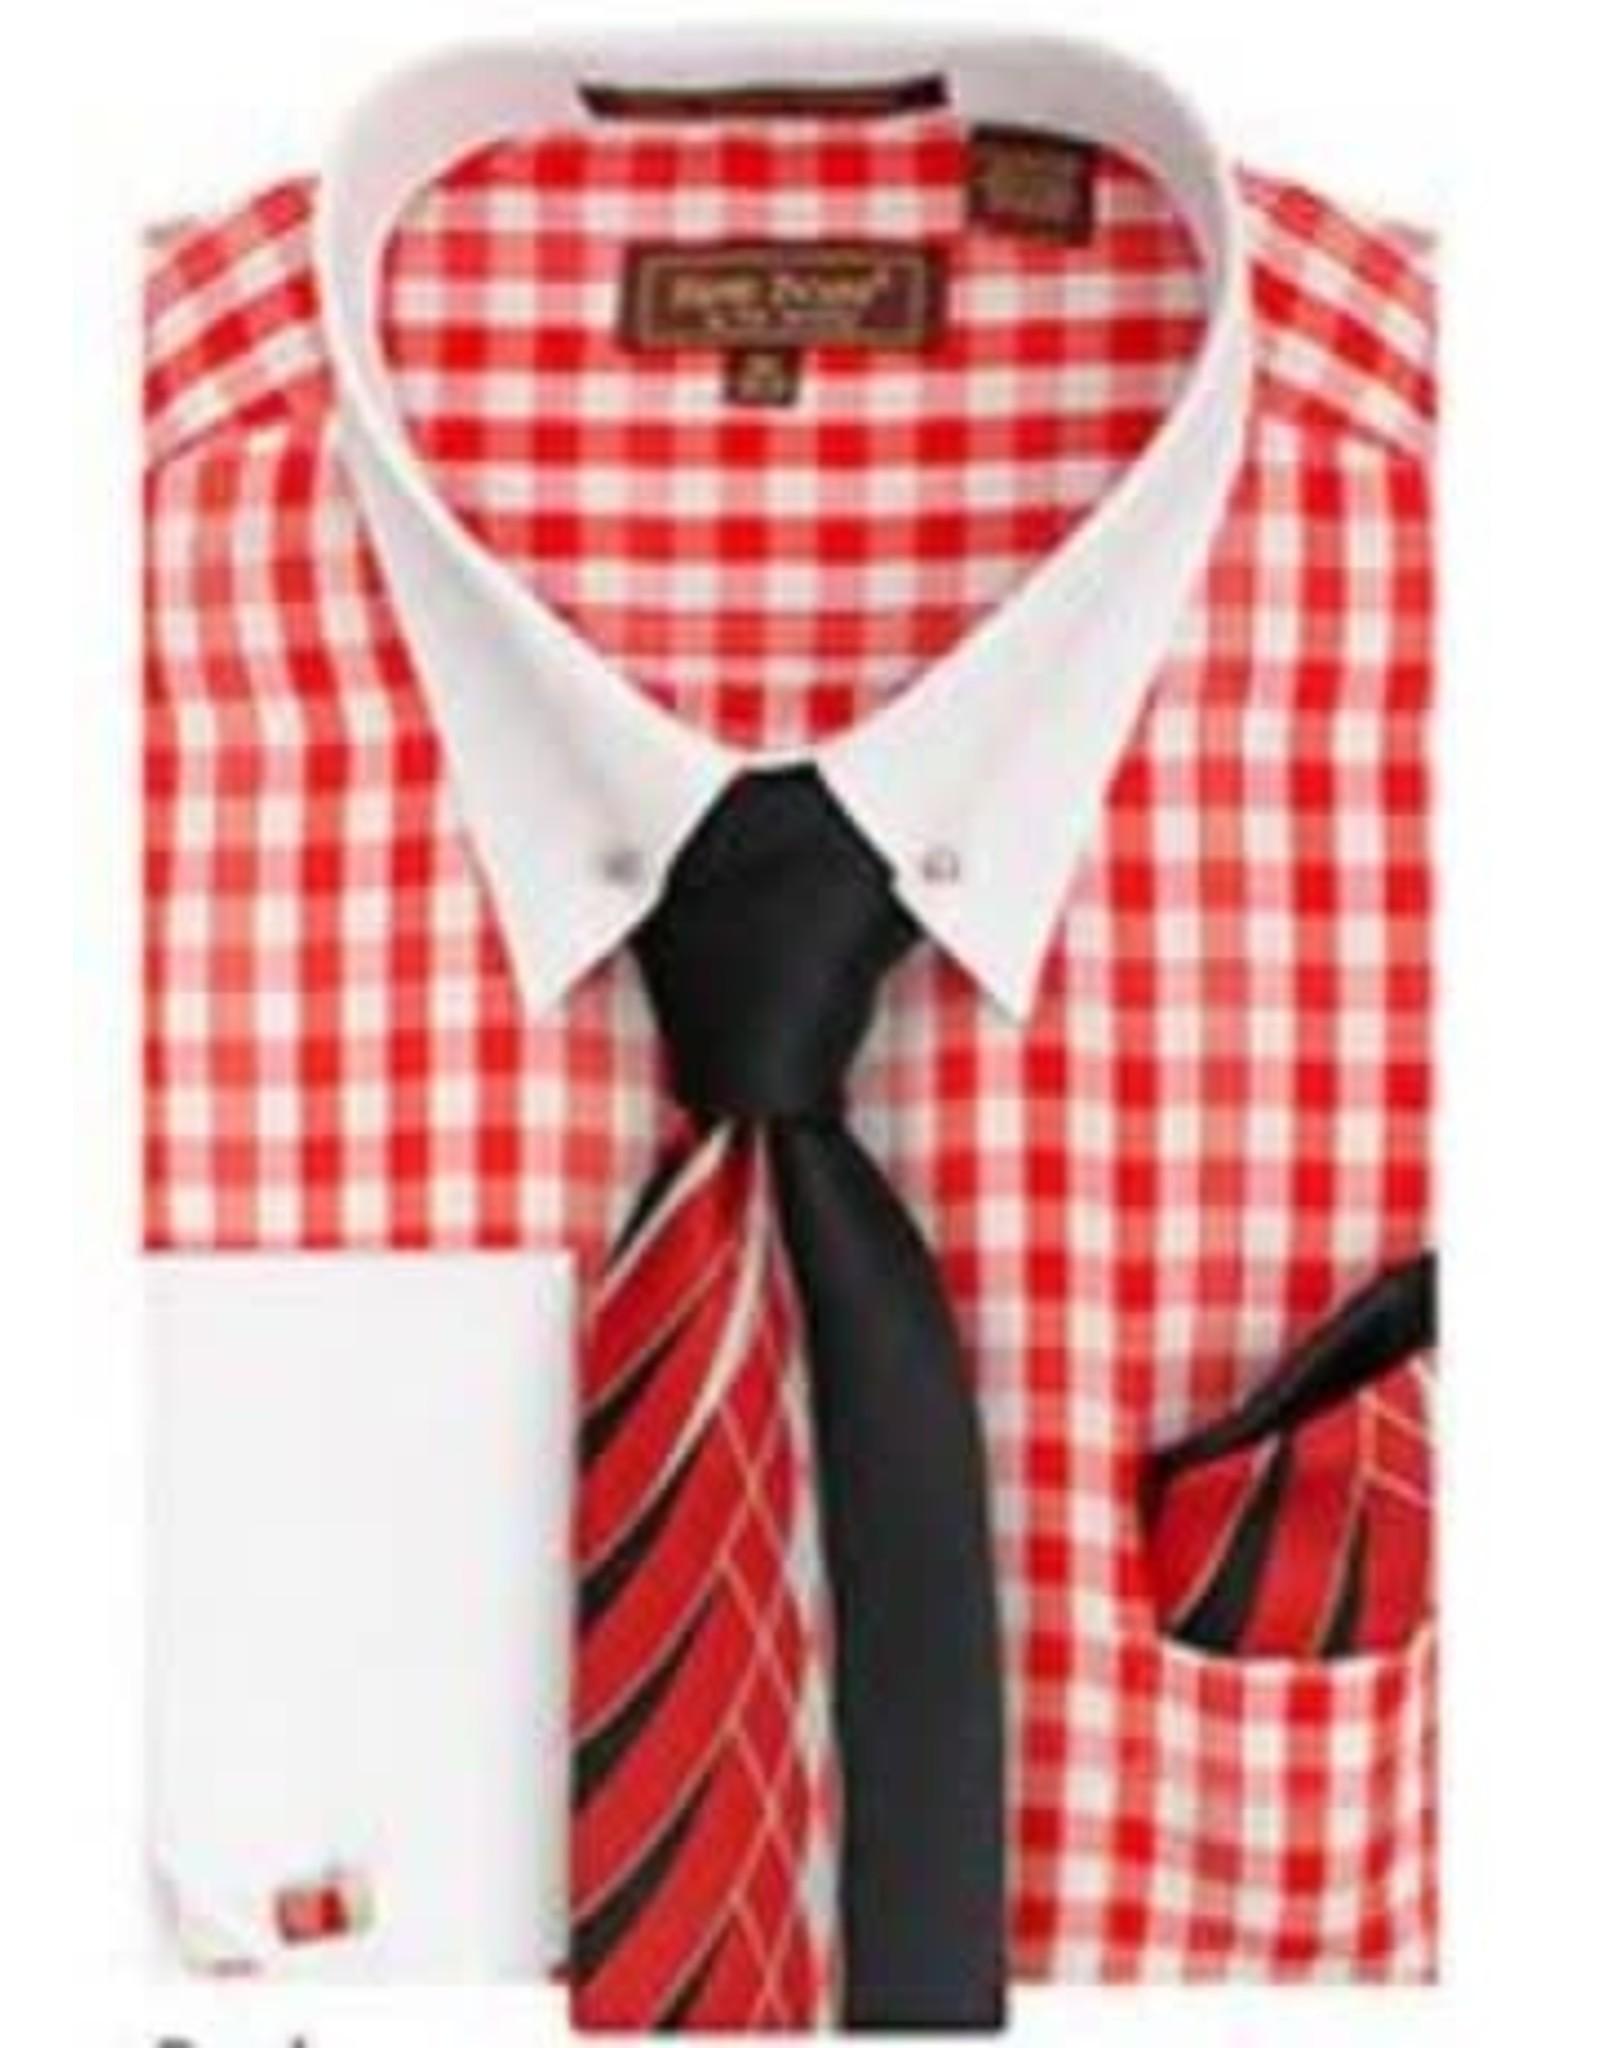 Henri Picard Henri Picard Shirt Set FC172 Red